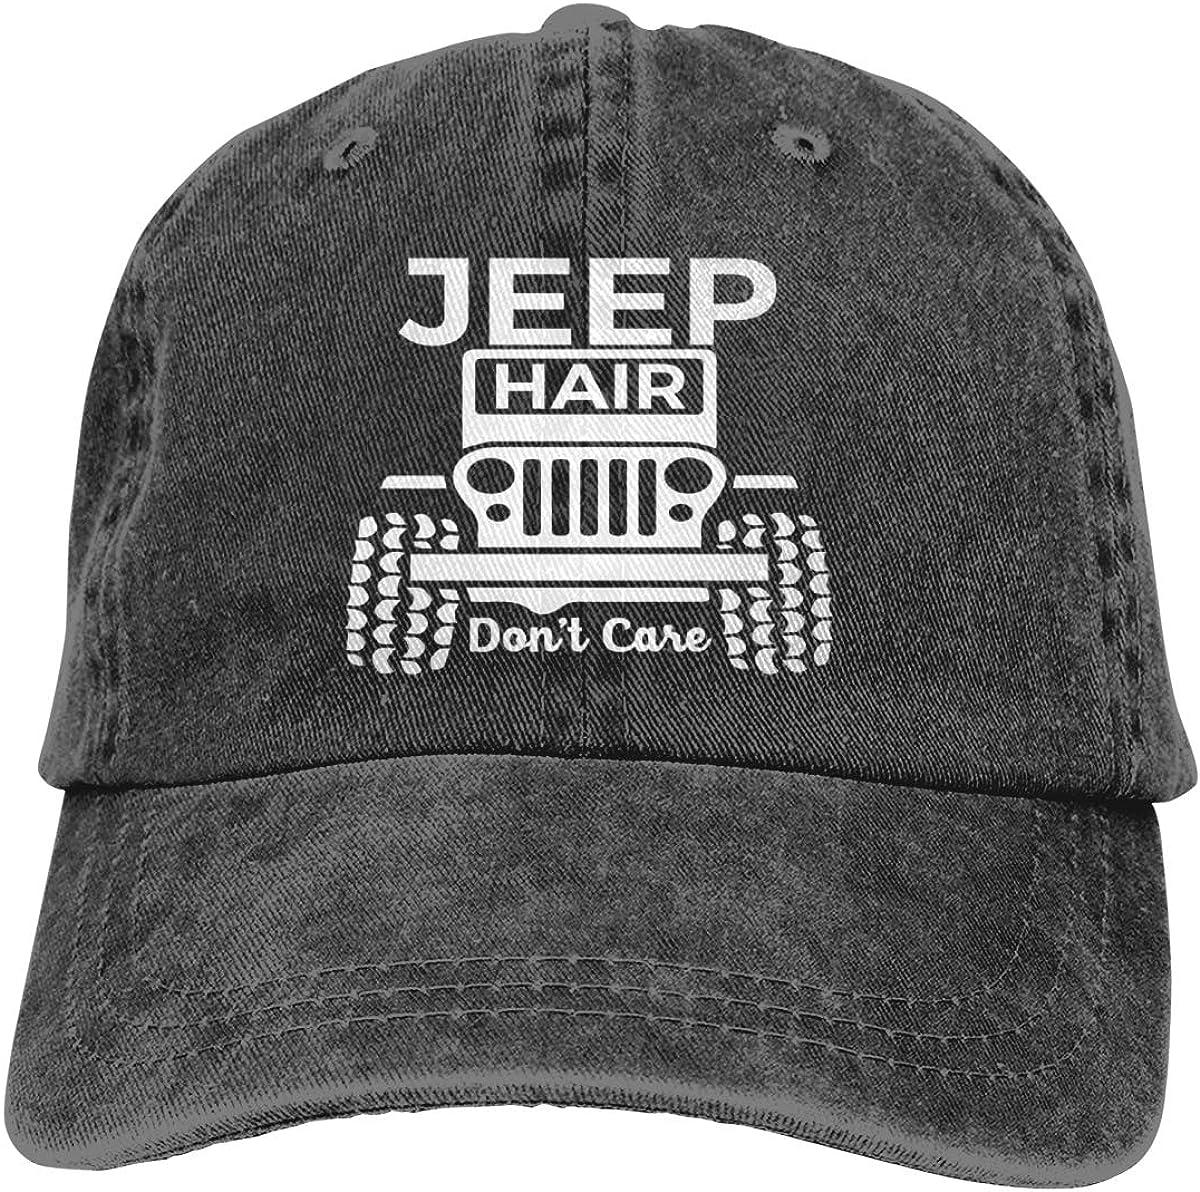 Jeep Hair Dont Care Classic Vintage Denim Cap Adjustable Baseball Hats Unisex